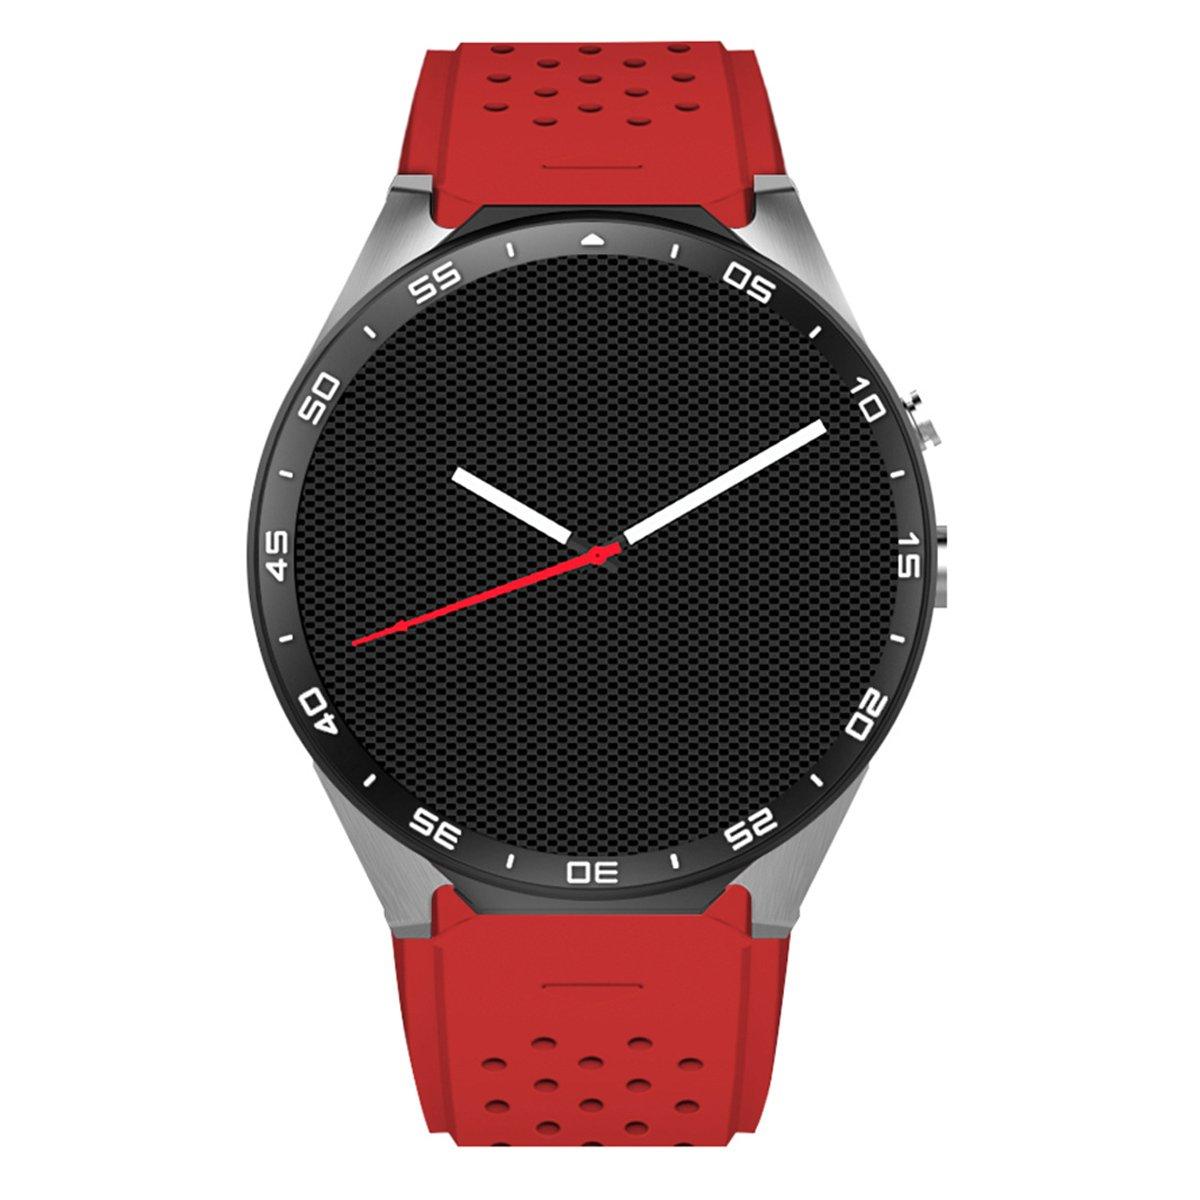 Fashion Android 5.1 Quad-Core 1.39'' Smart Watch 400mAh Li-Polymer Battery, 4GB ROM, Wi-Fi, GPS